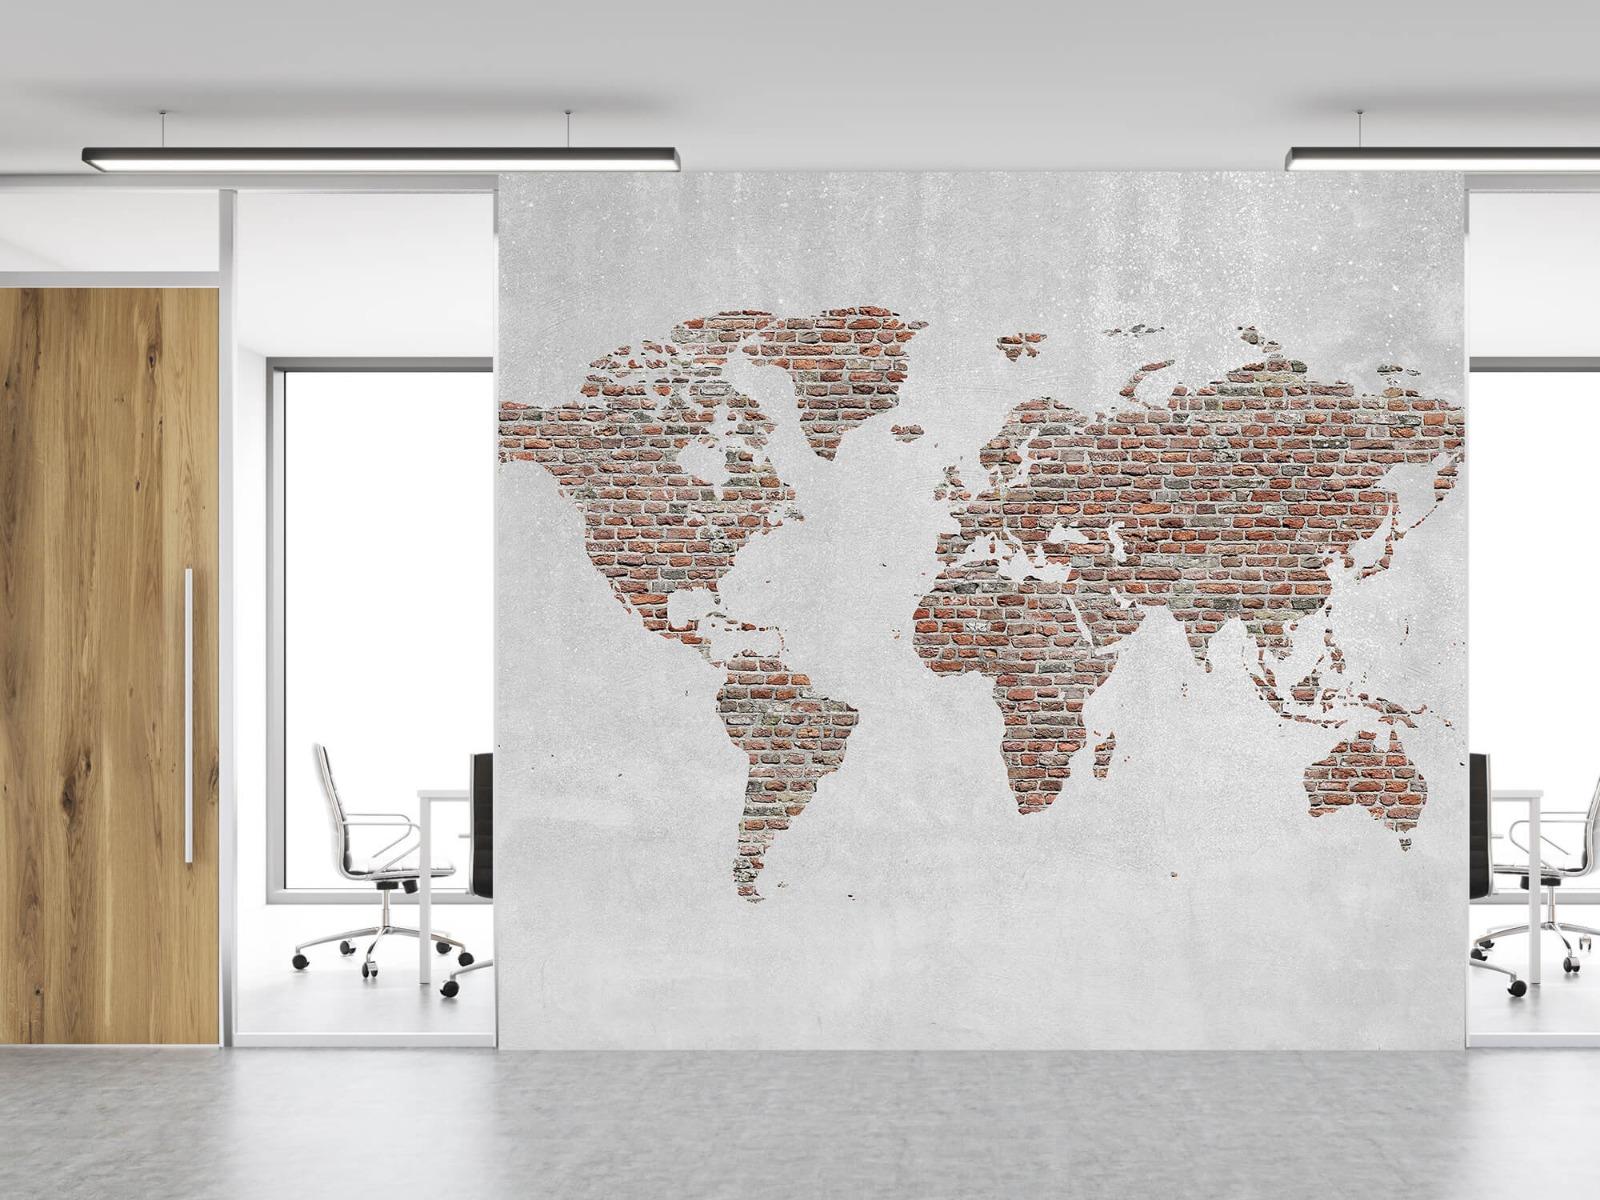 Steen behang - Wereldkaart stenen - Slaapkamer 11